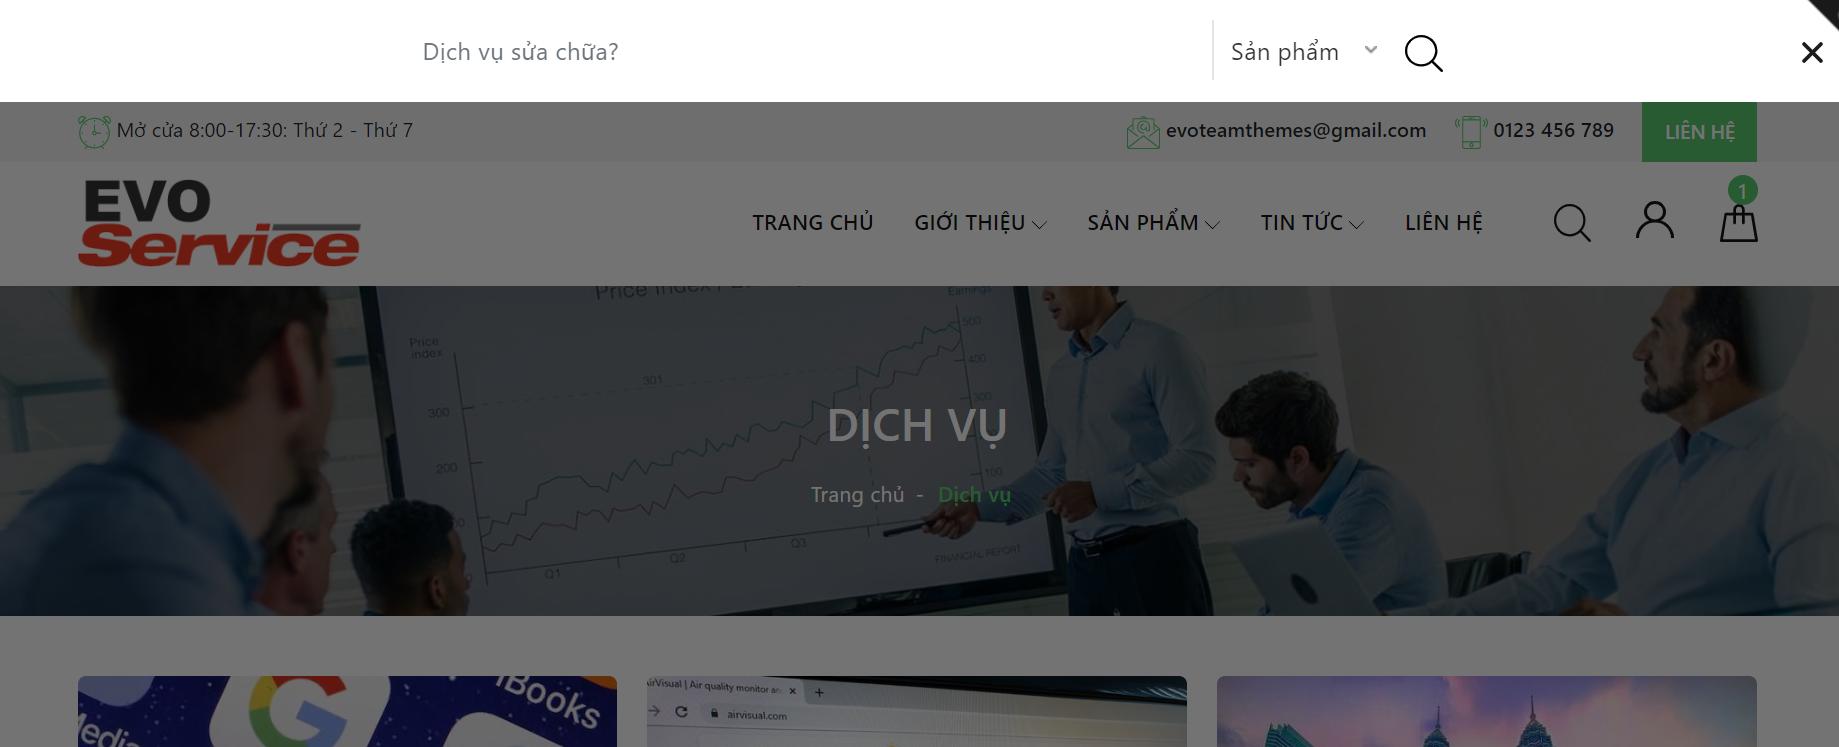 Evo Services Tìm kiếm